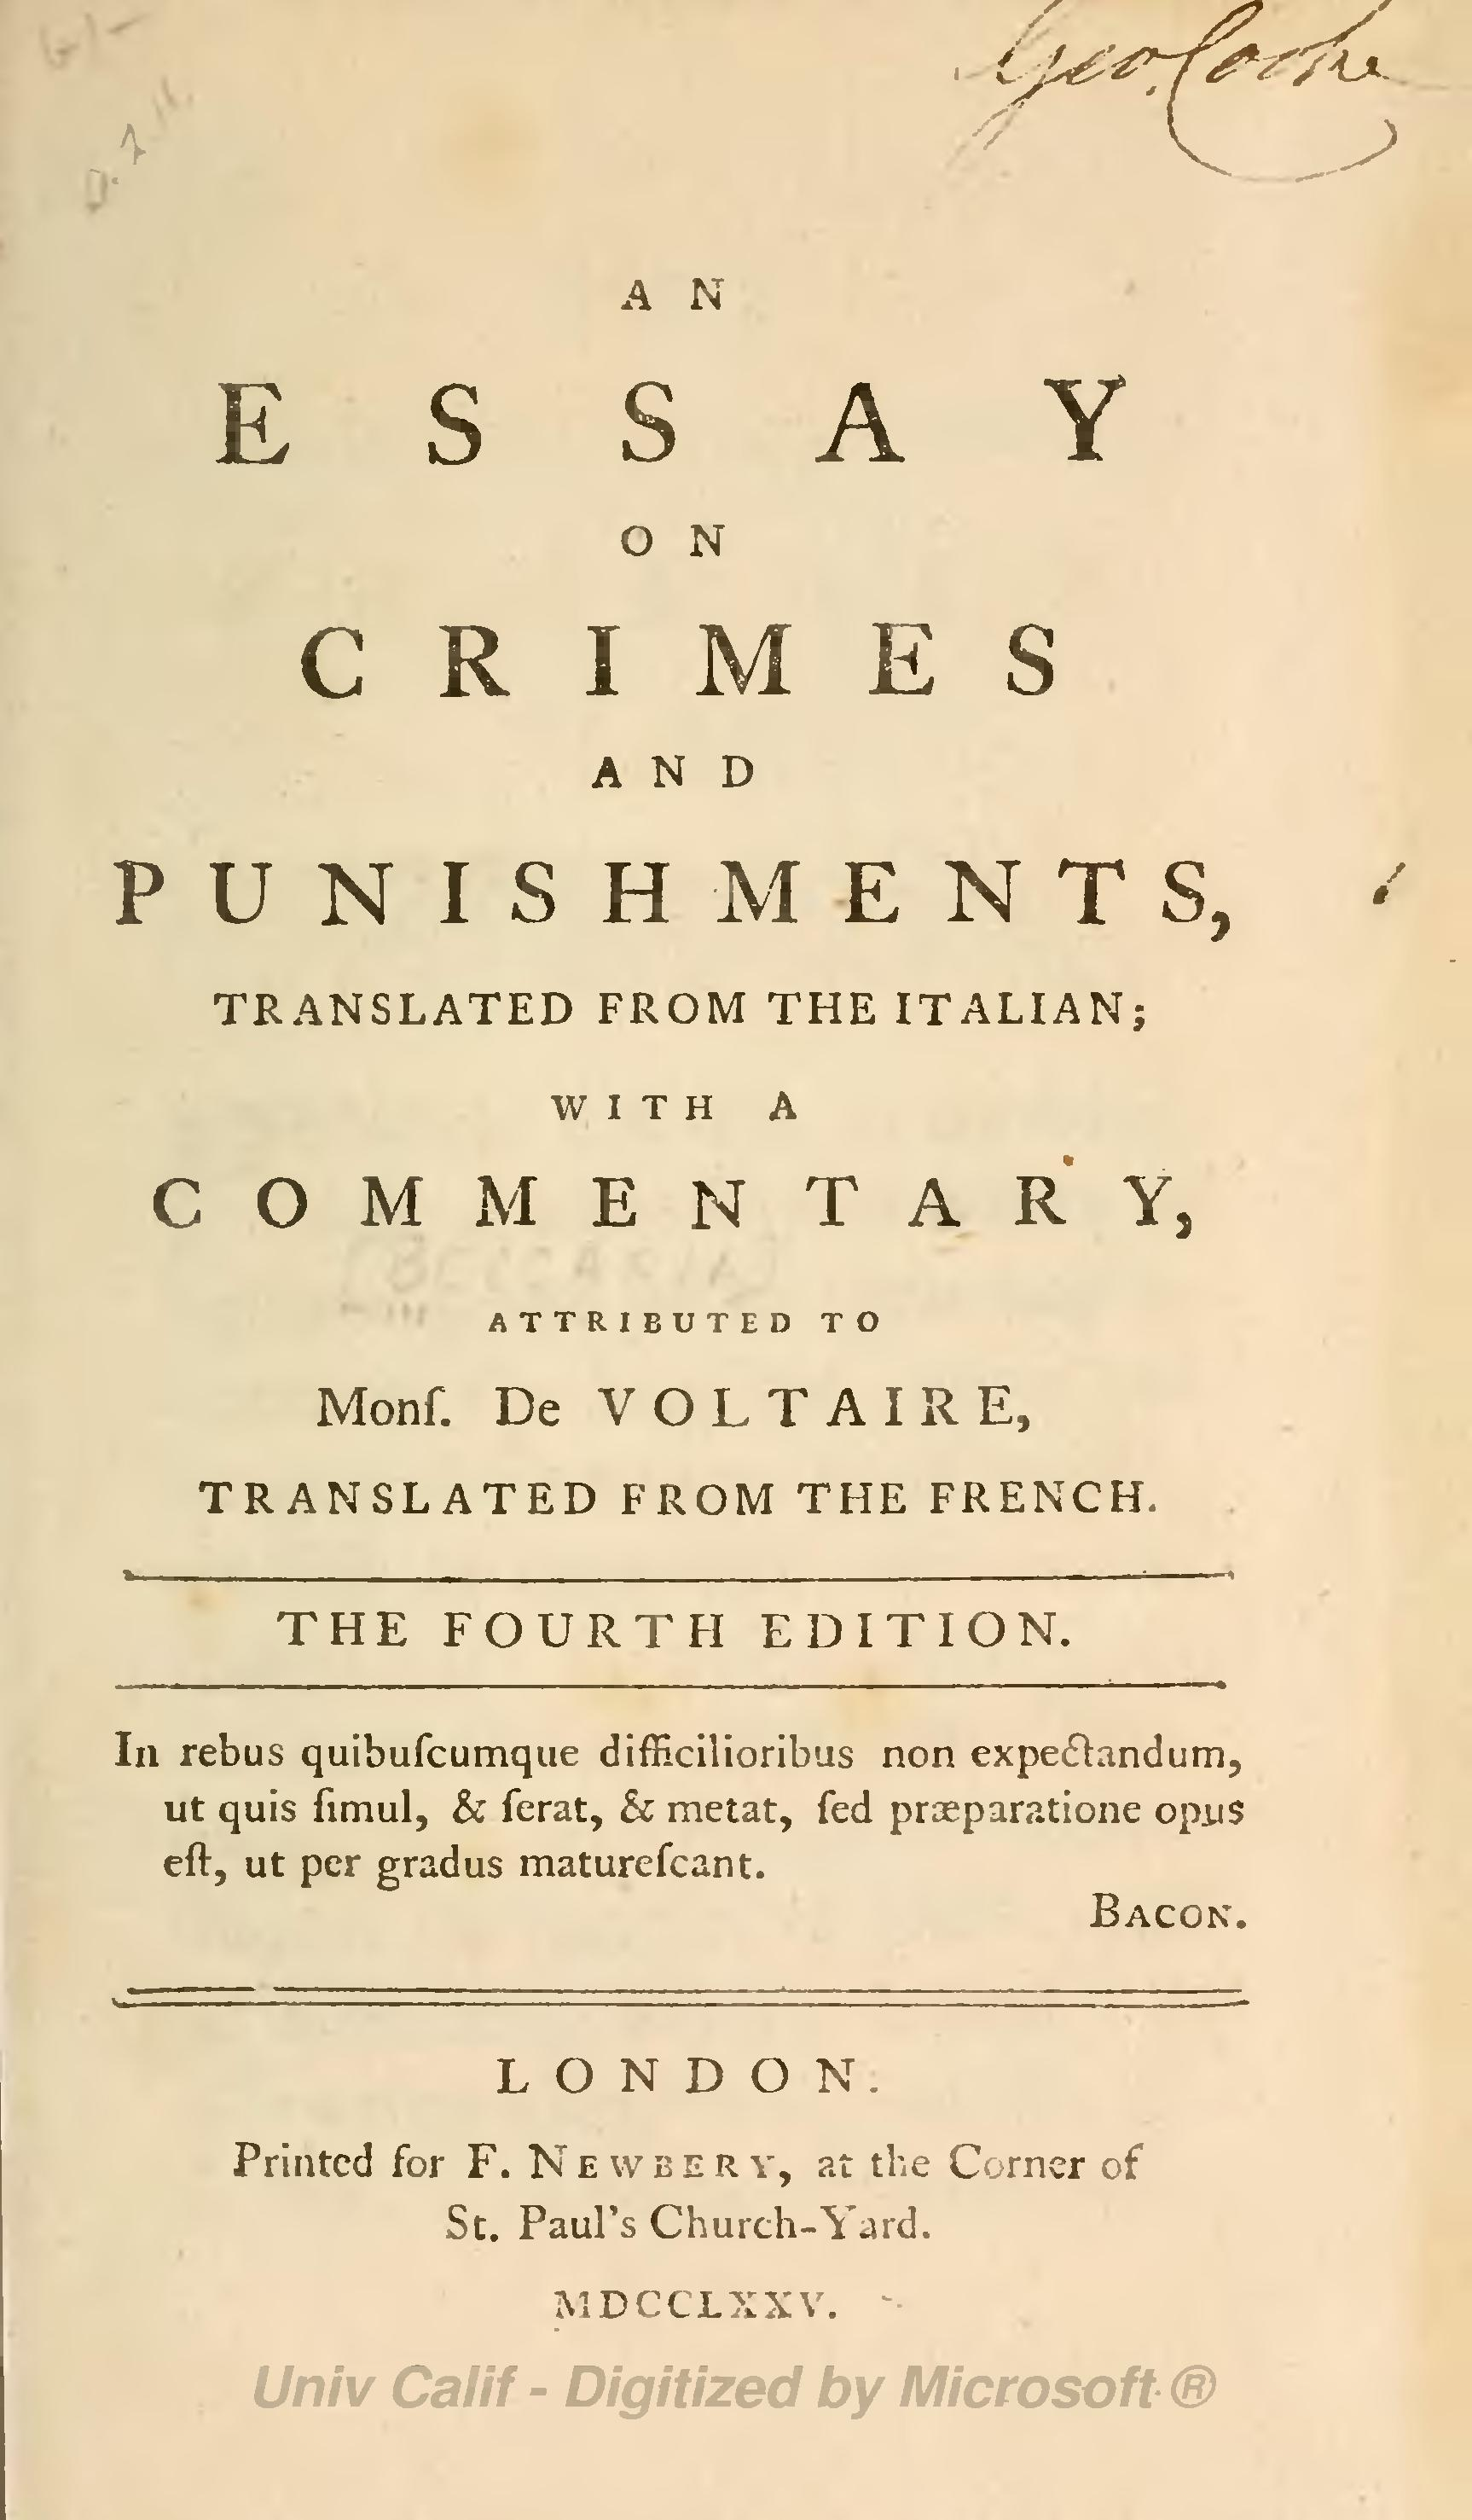 015 Essays Crime And Punishment Page Essay Crimes Punishments Topics Ap Prompts For Ib Dostoevsky Wondrous Outline Pdf Ielts Full